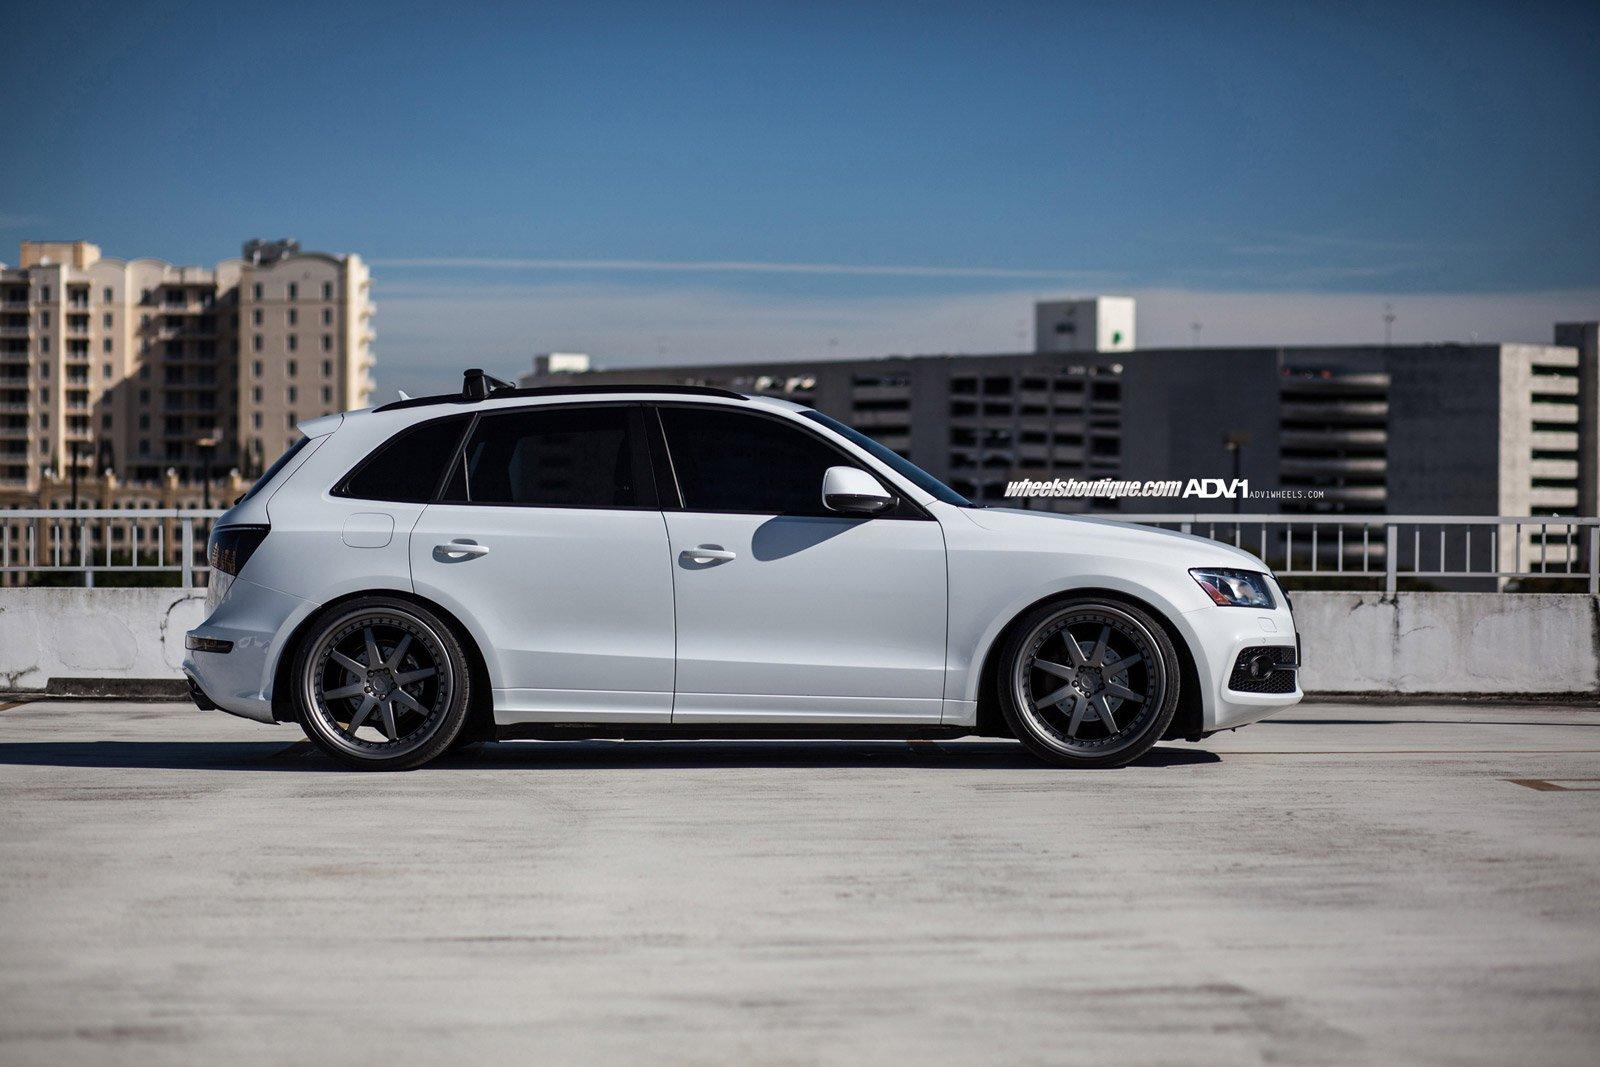 2014 Adv1 Audi Q5 Suv Wheels Wallpaper 1600x1067